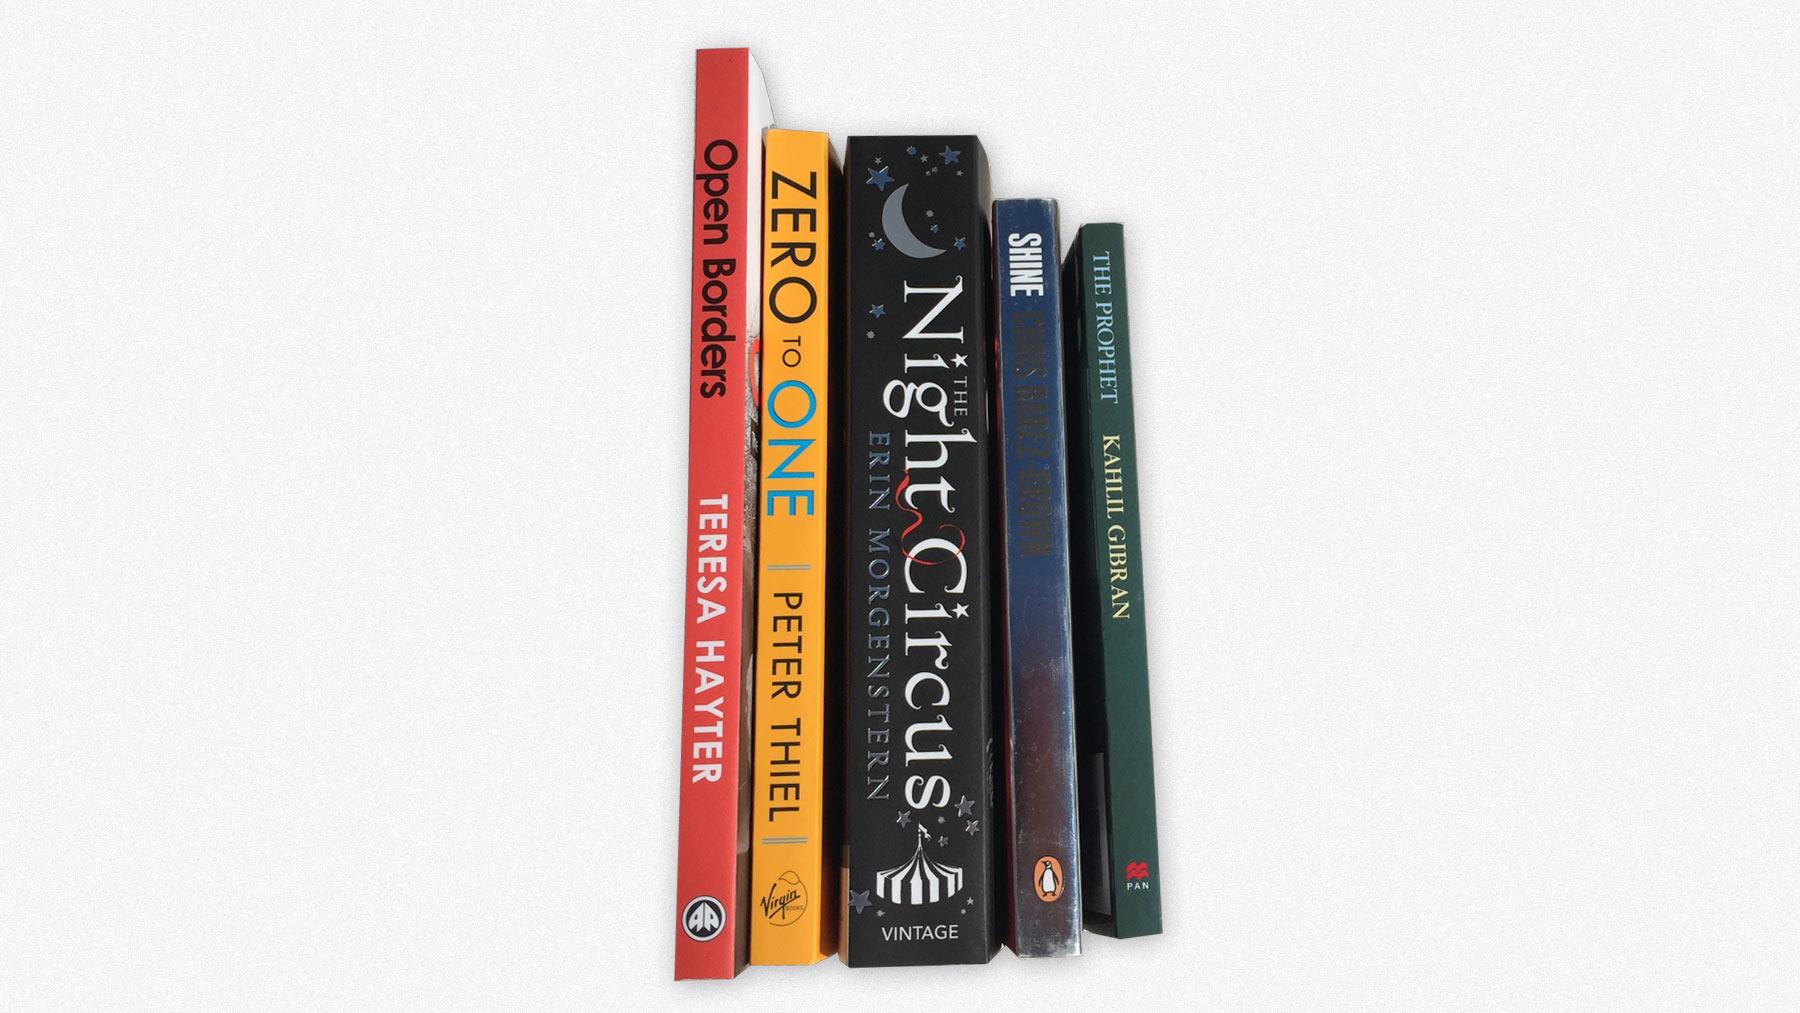 The Lush Library: The Reading List - Lush Fresh Handmade